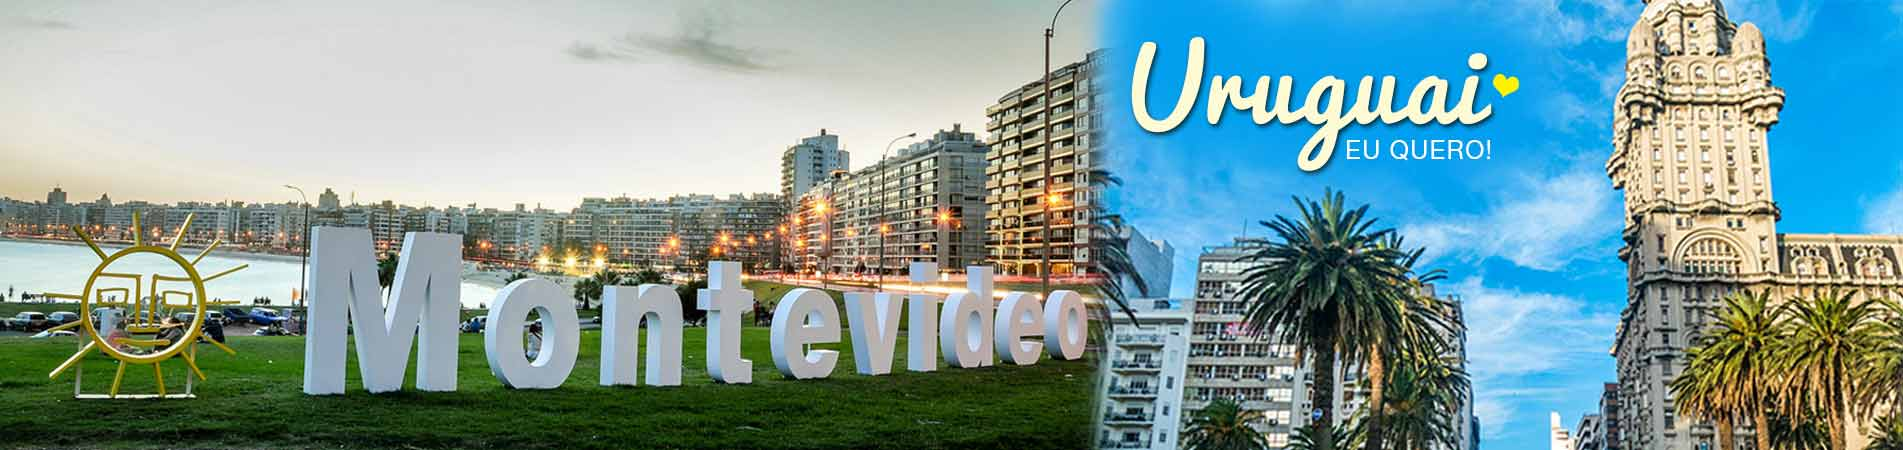 naja-turismo-banner-uruguai